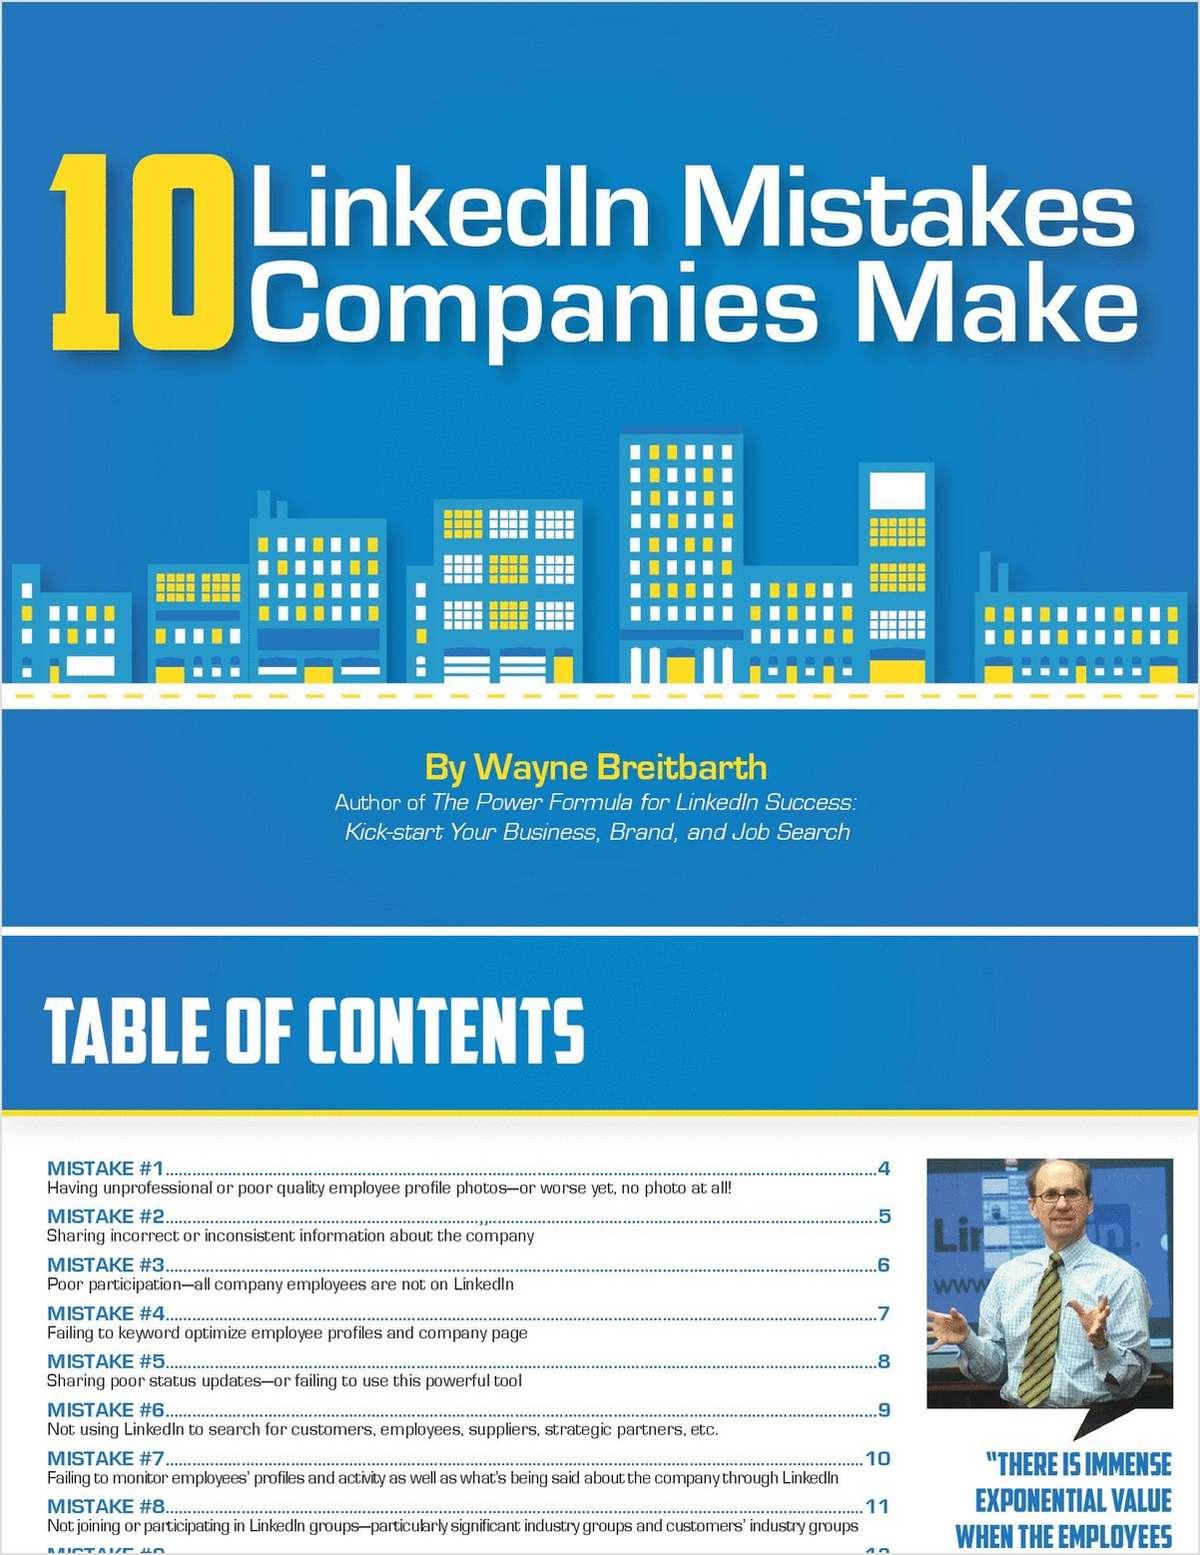 10 LinkedIn Mistakes Companies Make